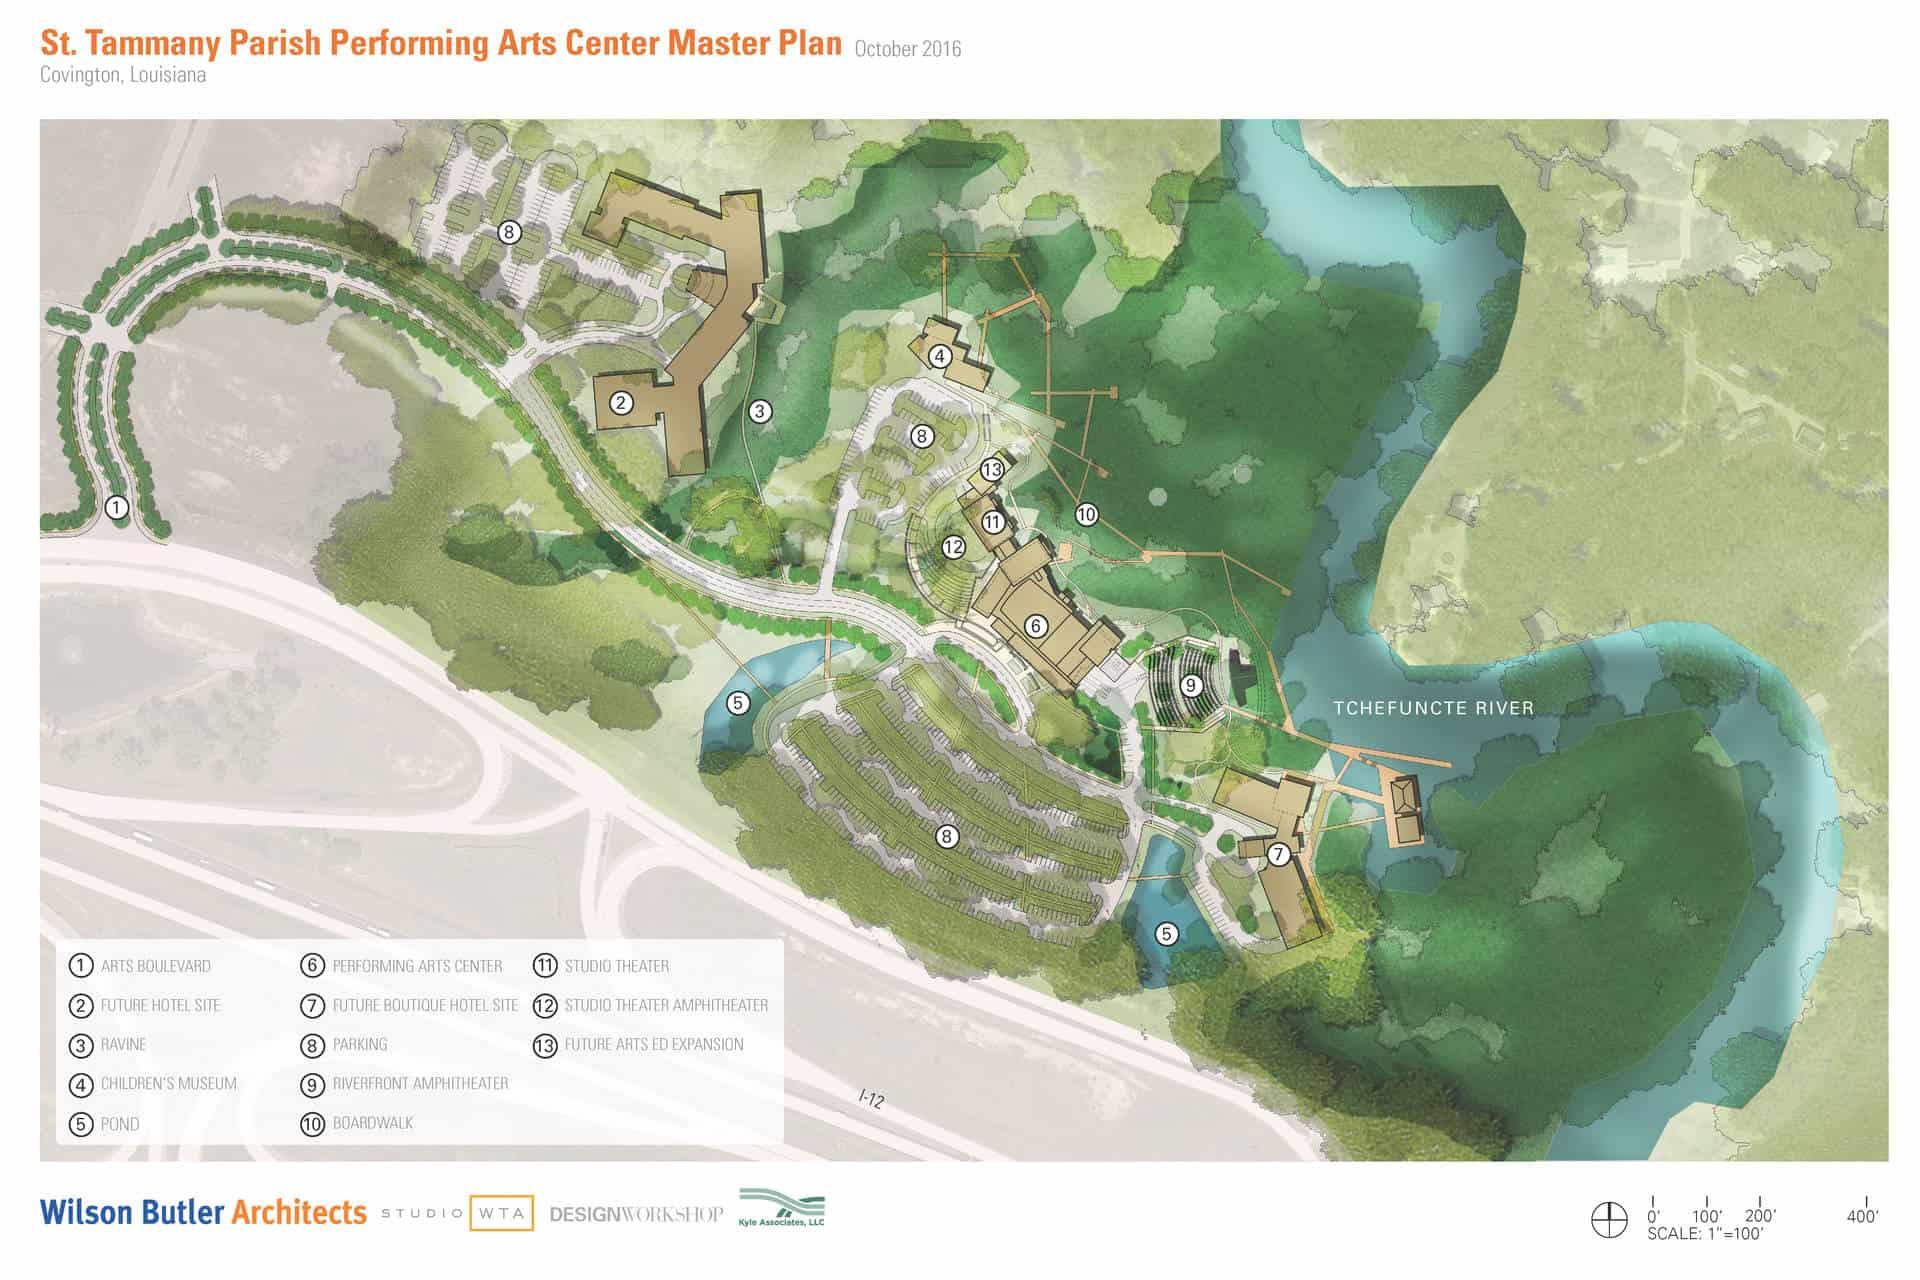 St. Tammany Parish Cultural Arts District Site Master Plan/Illustration done by Design Workshop